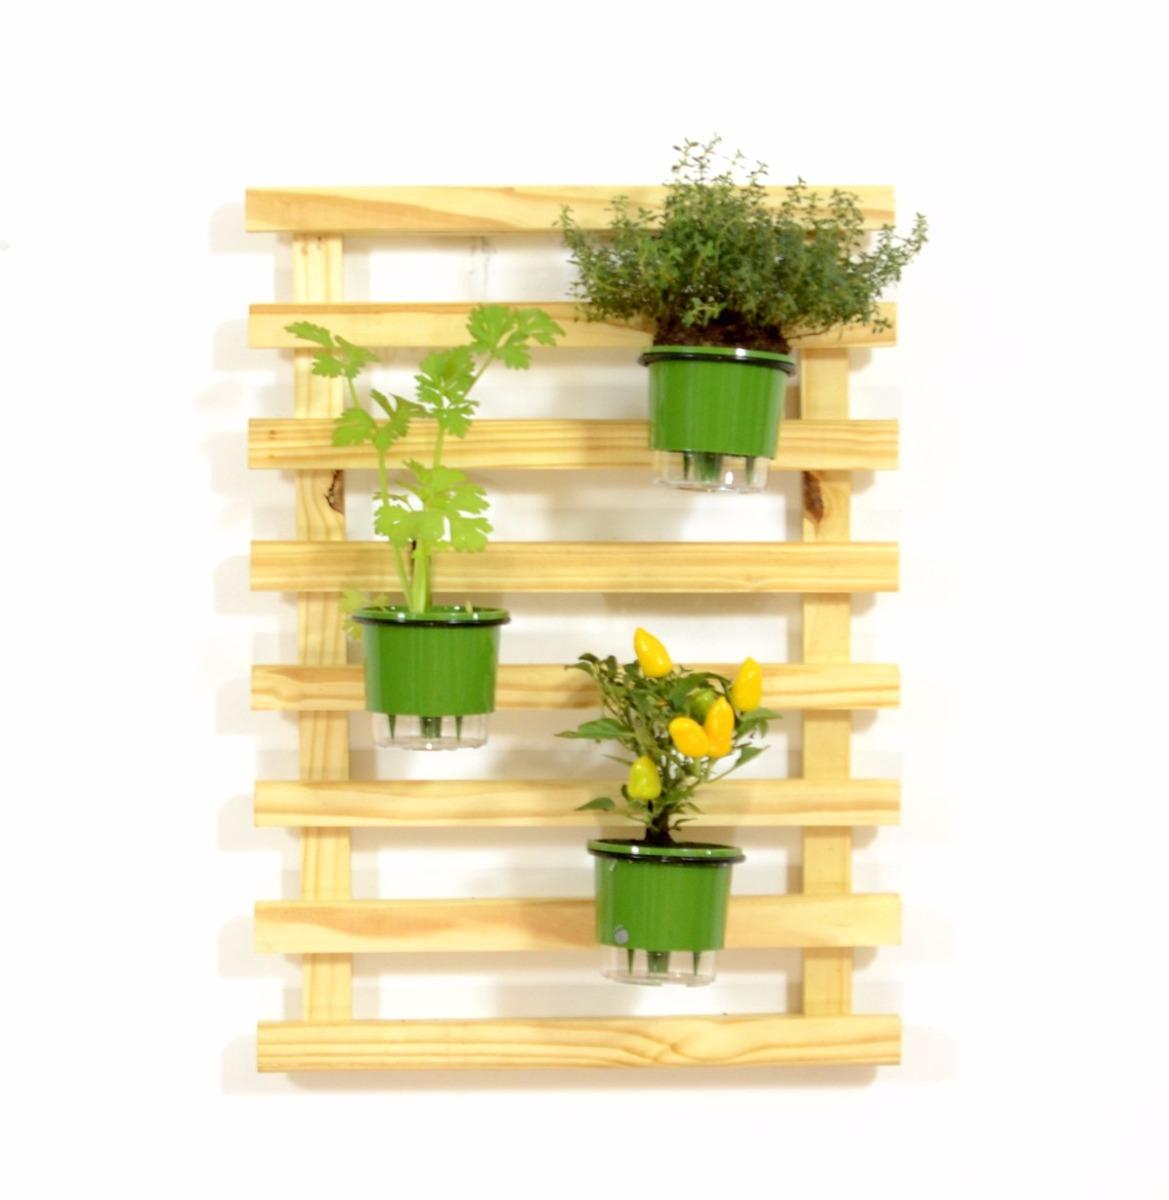 Frete Gr Tis Floreira Vertical Jardim 3 Vasos Autoirrigaveis R  -> Floreira Vertical